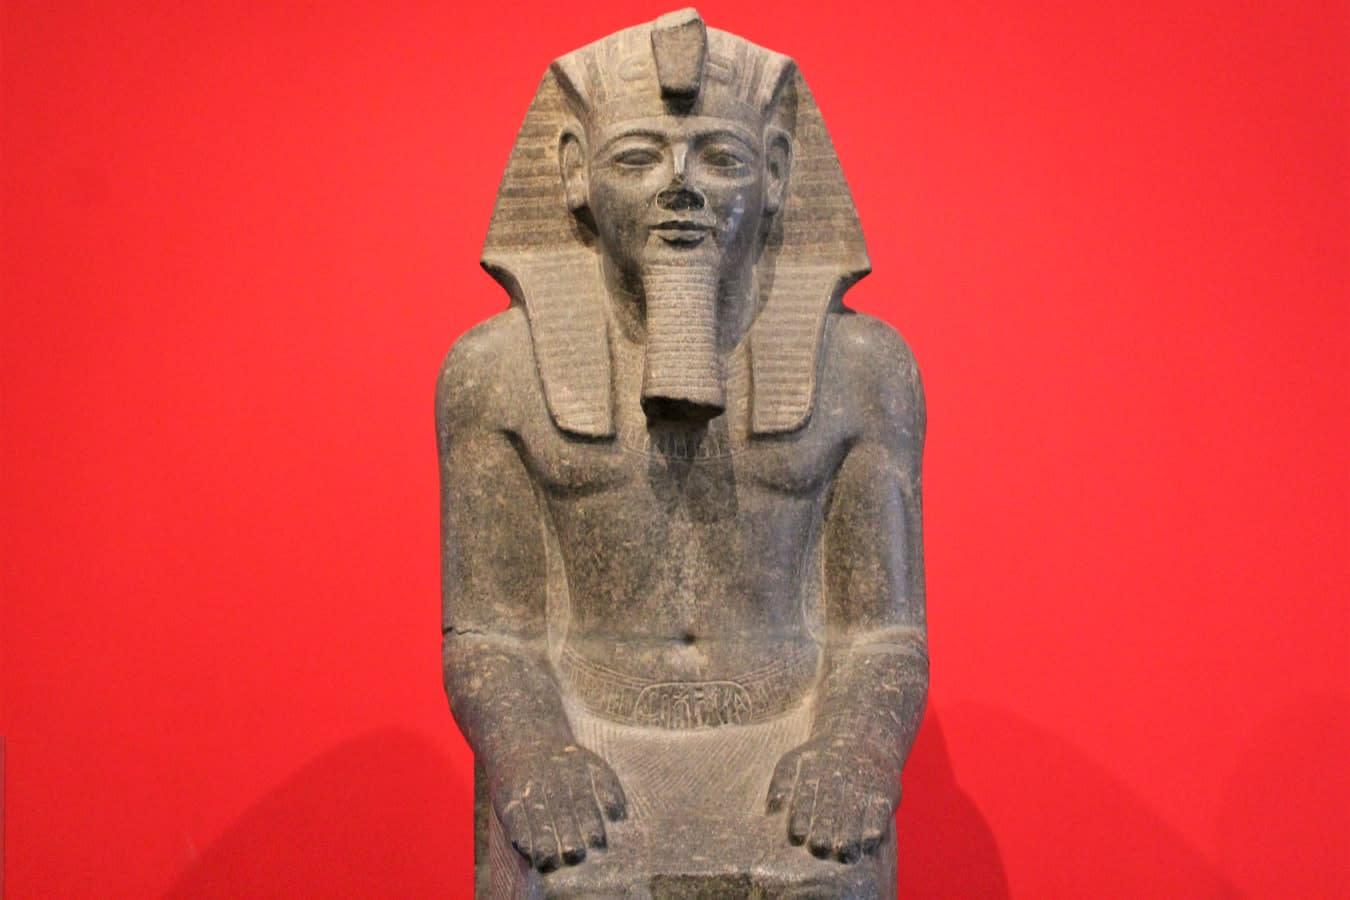 Ramses Book: Οι δημοφιλείς σειρές κουλοχέρηδων του Casumo